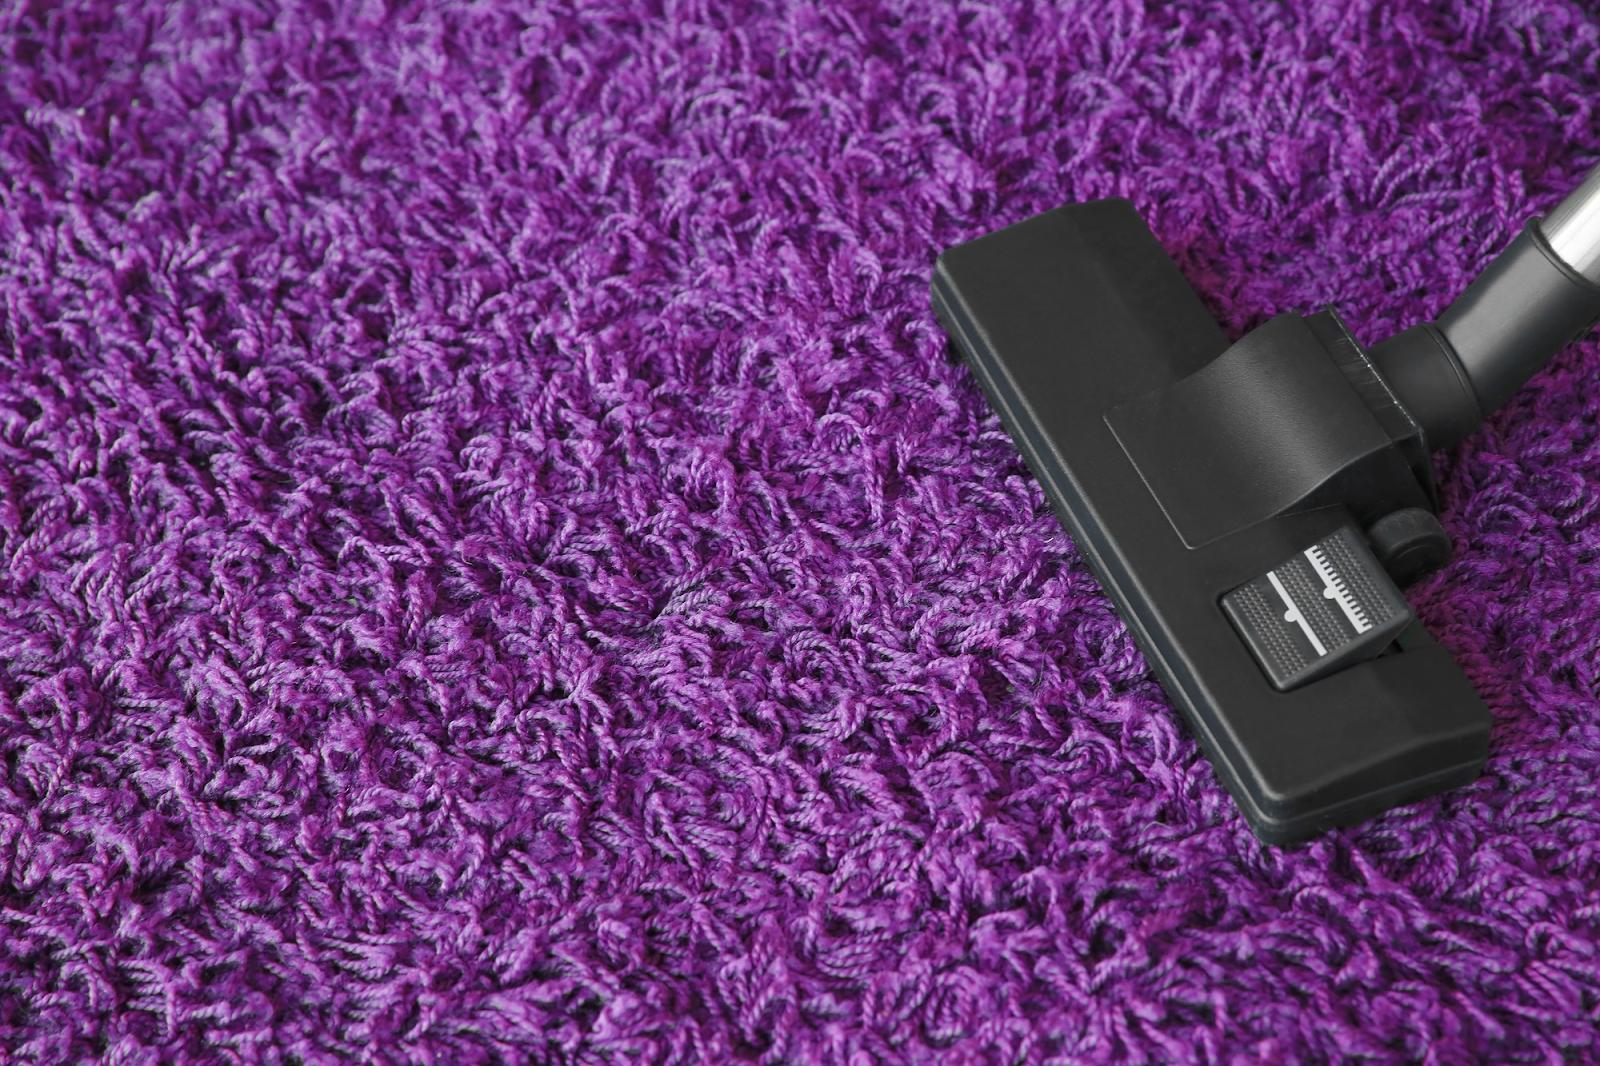 close up photo of black vacuum on purple carpet